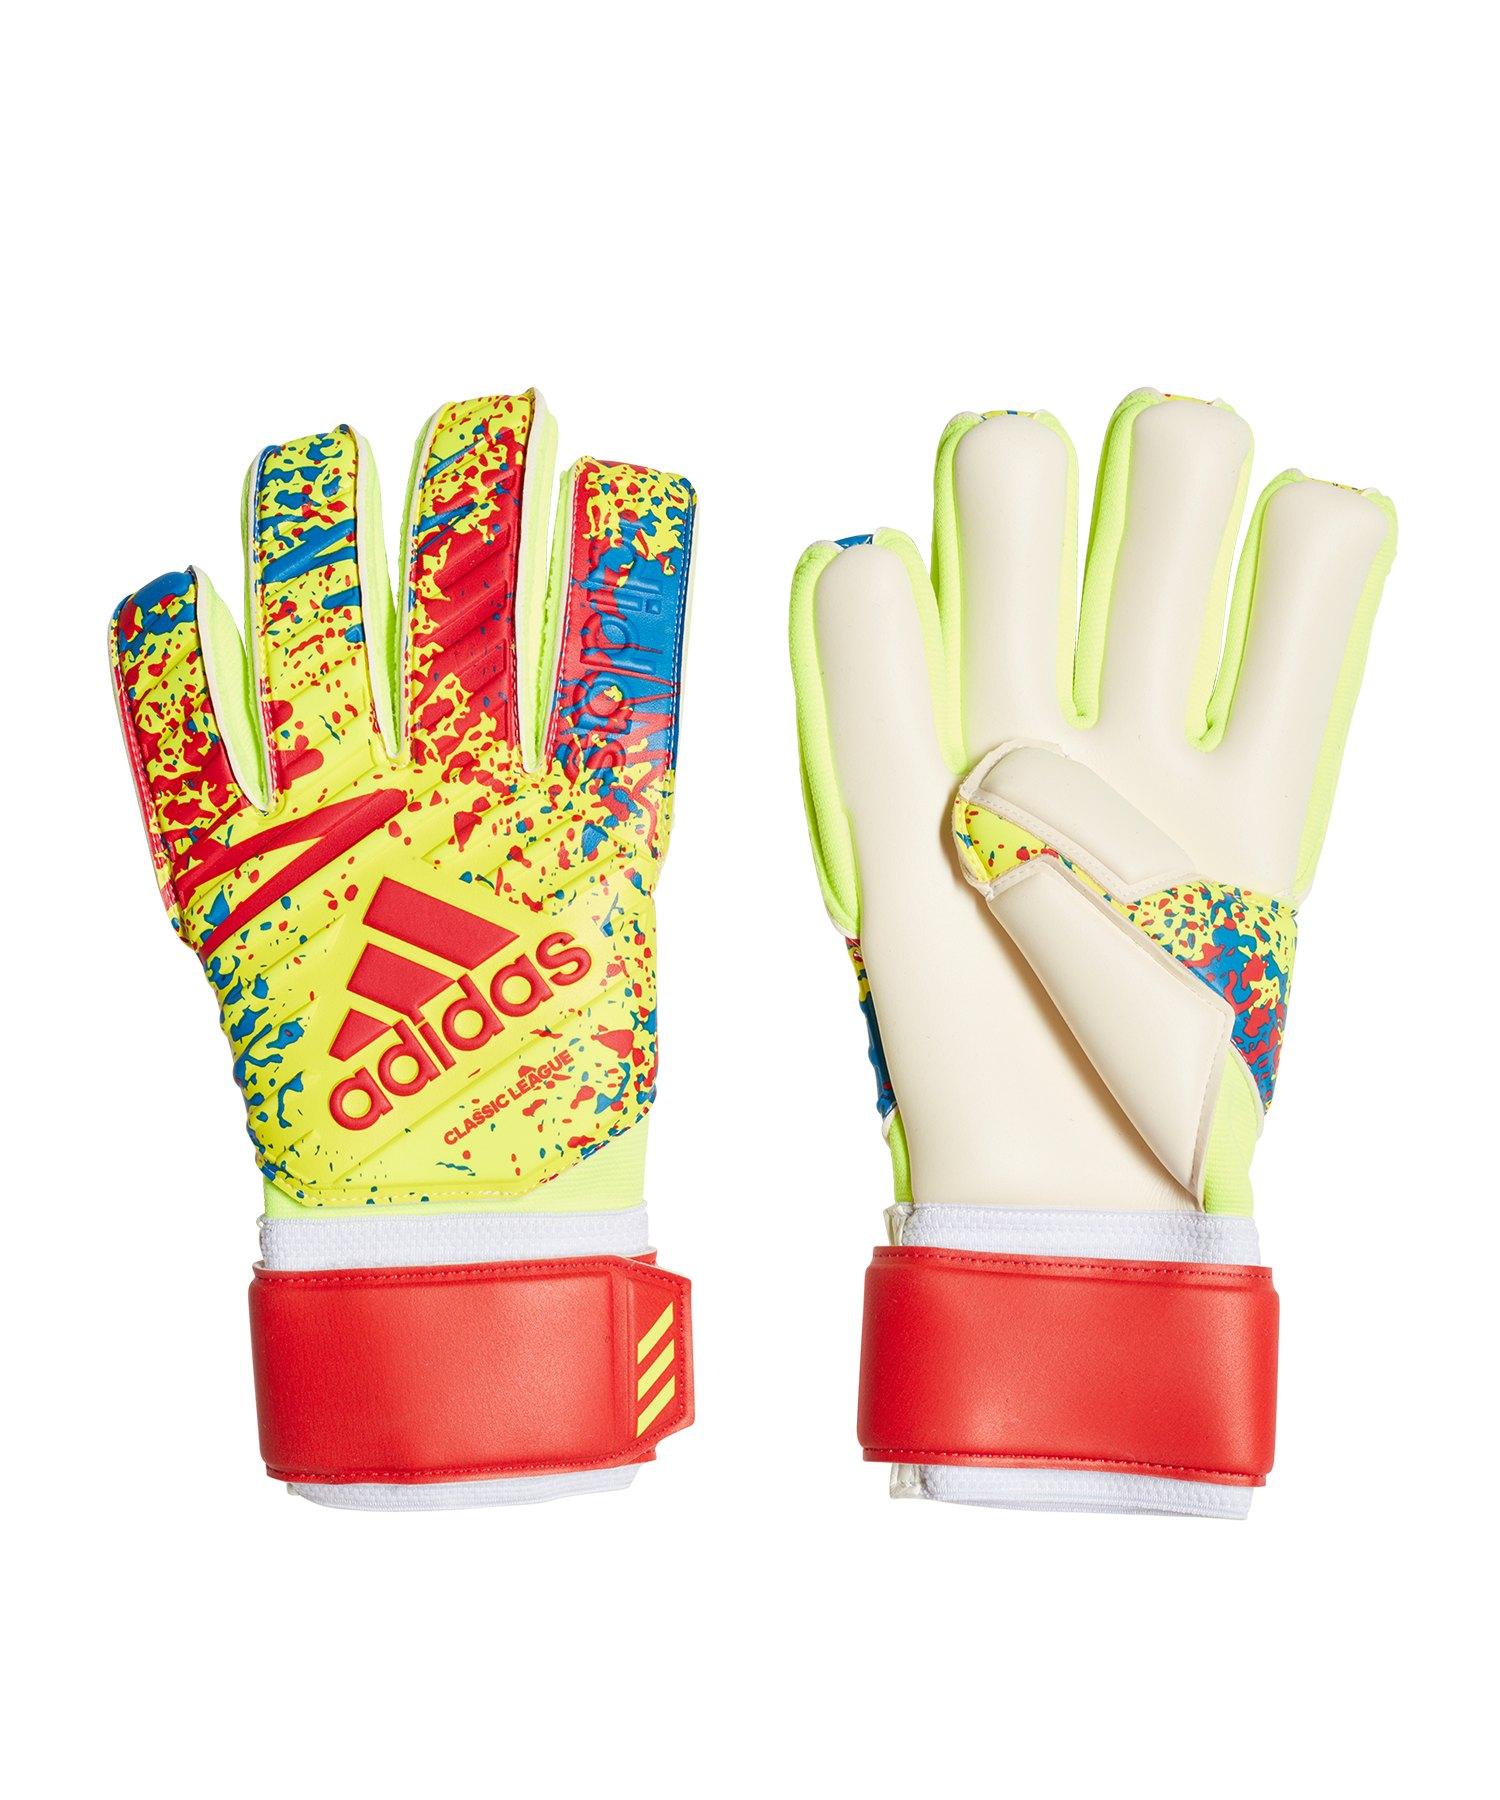 adidas Classic League TW-Handschuh Gelb Rot - gelb